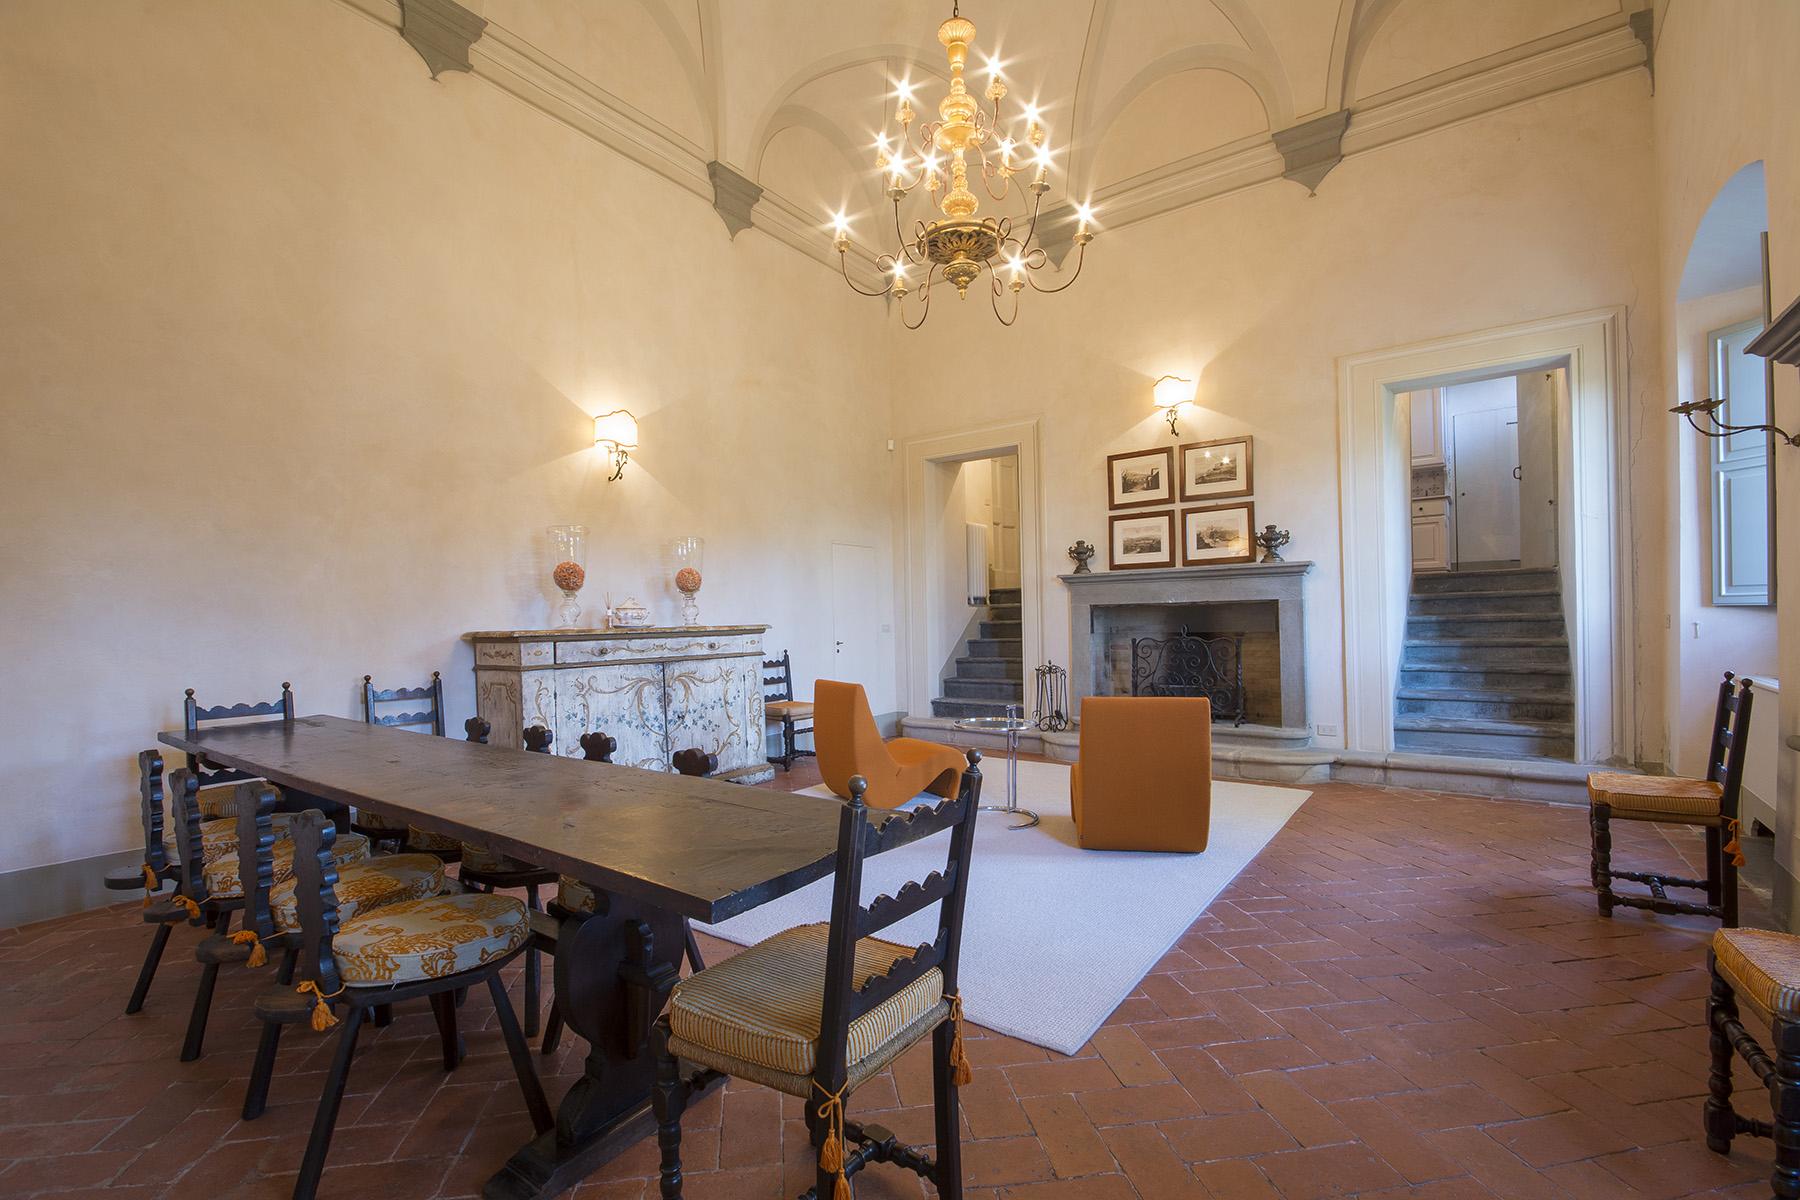 Villa in Affitto a Impruneta: 5 locali, 560 mq - Foto 4